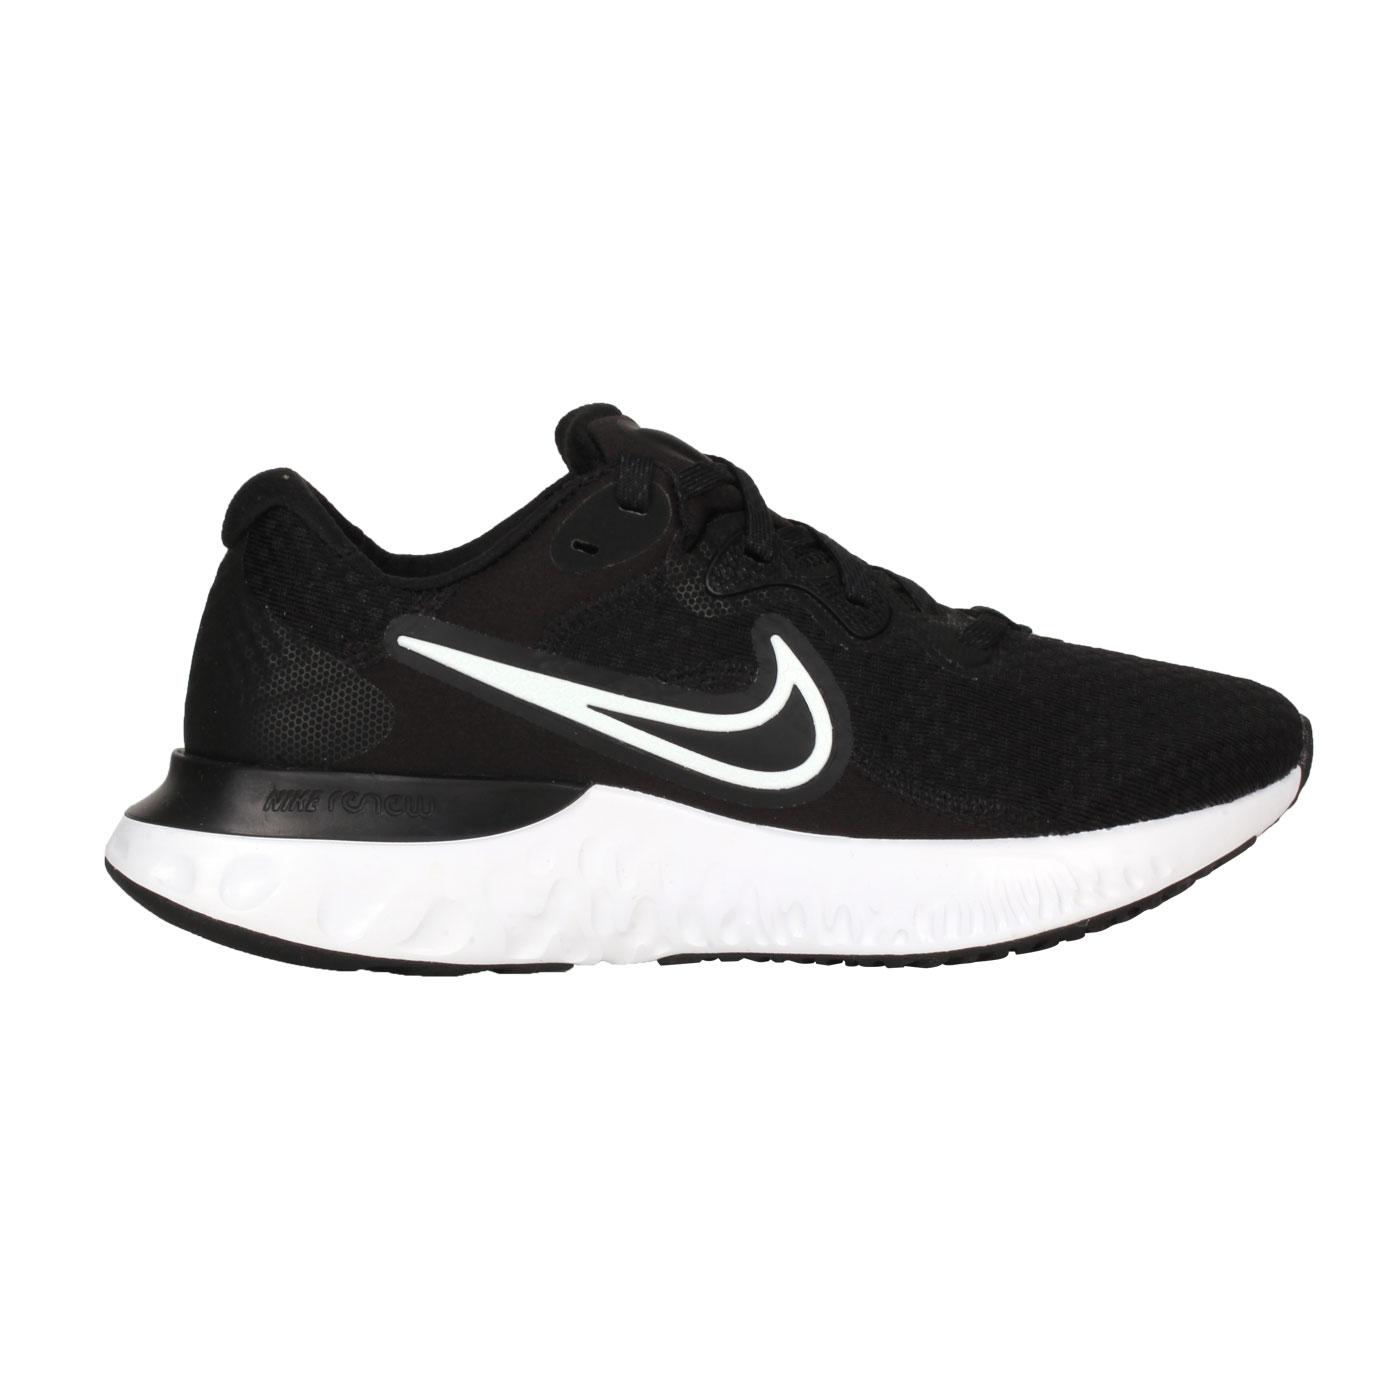 NIKE 女款休閒慢跑鞋  @WMNS  RENEW RUN 2@CU3505005 - 黑白